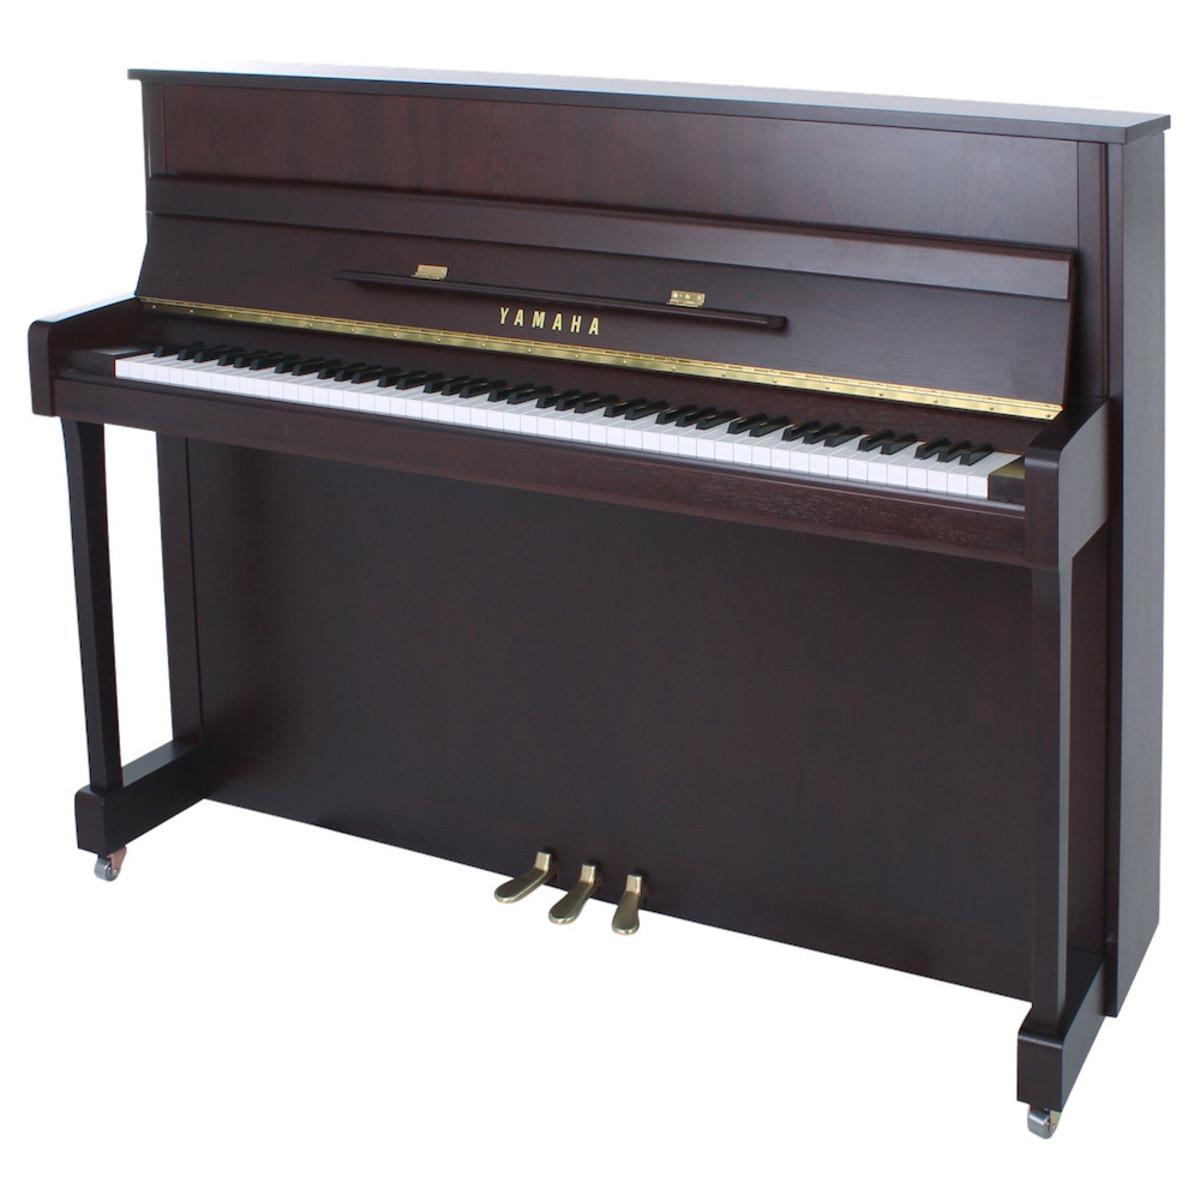 Yamaha b2 upright acoustic piano dark walnut satin at for Yamaha pianos tampa